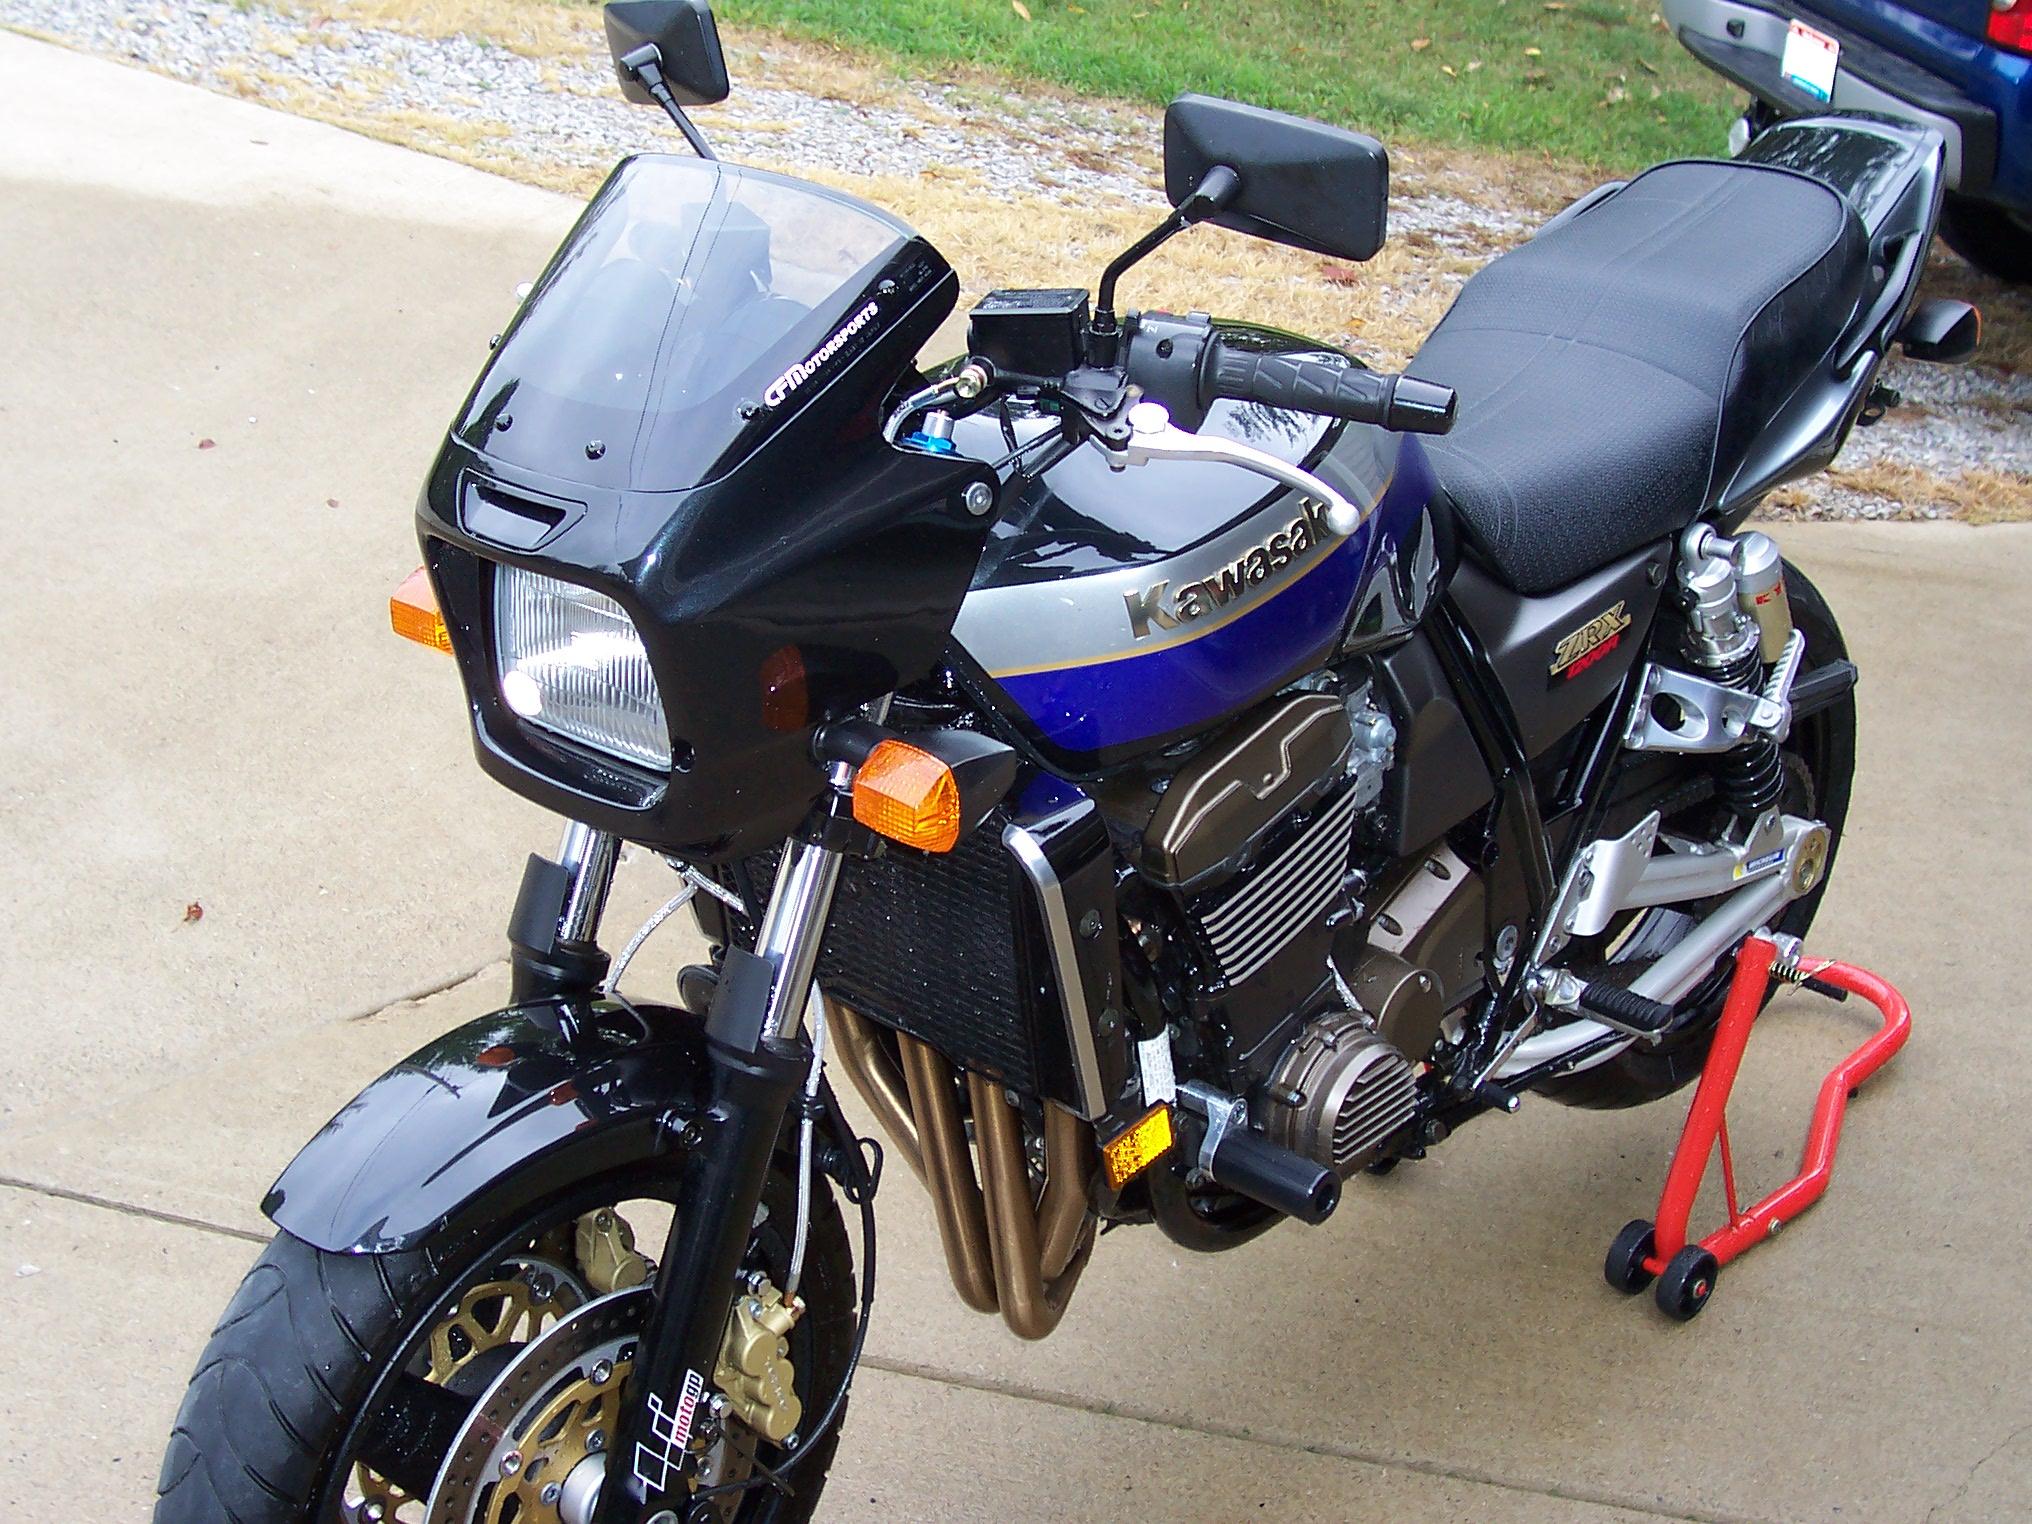 FOR SALE 2001 Kawasaki ZRX 1200R - Sportbikes.net